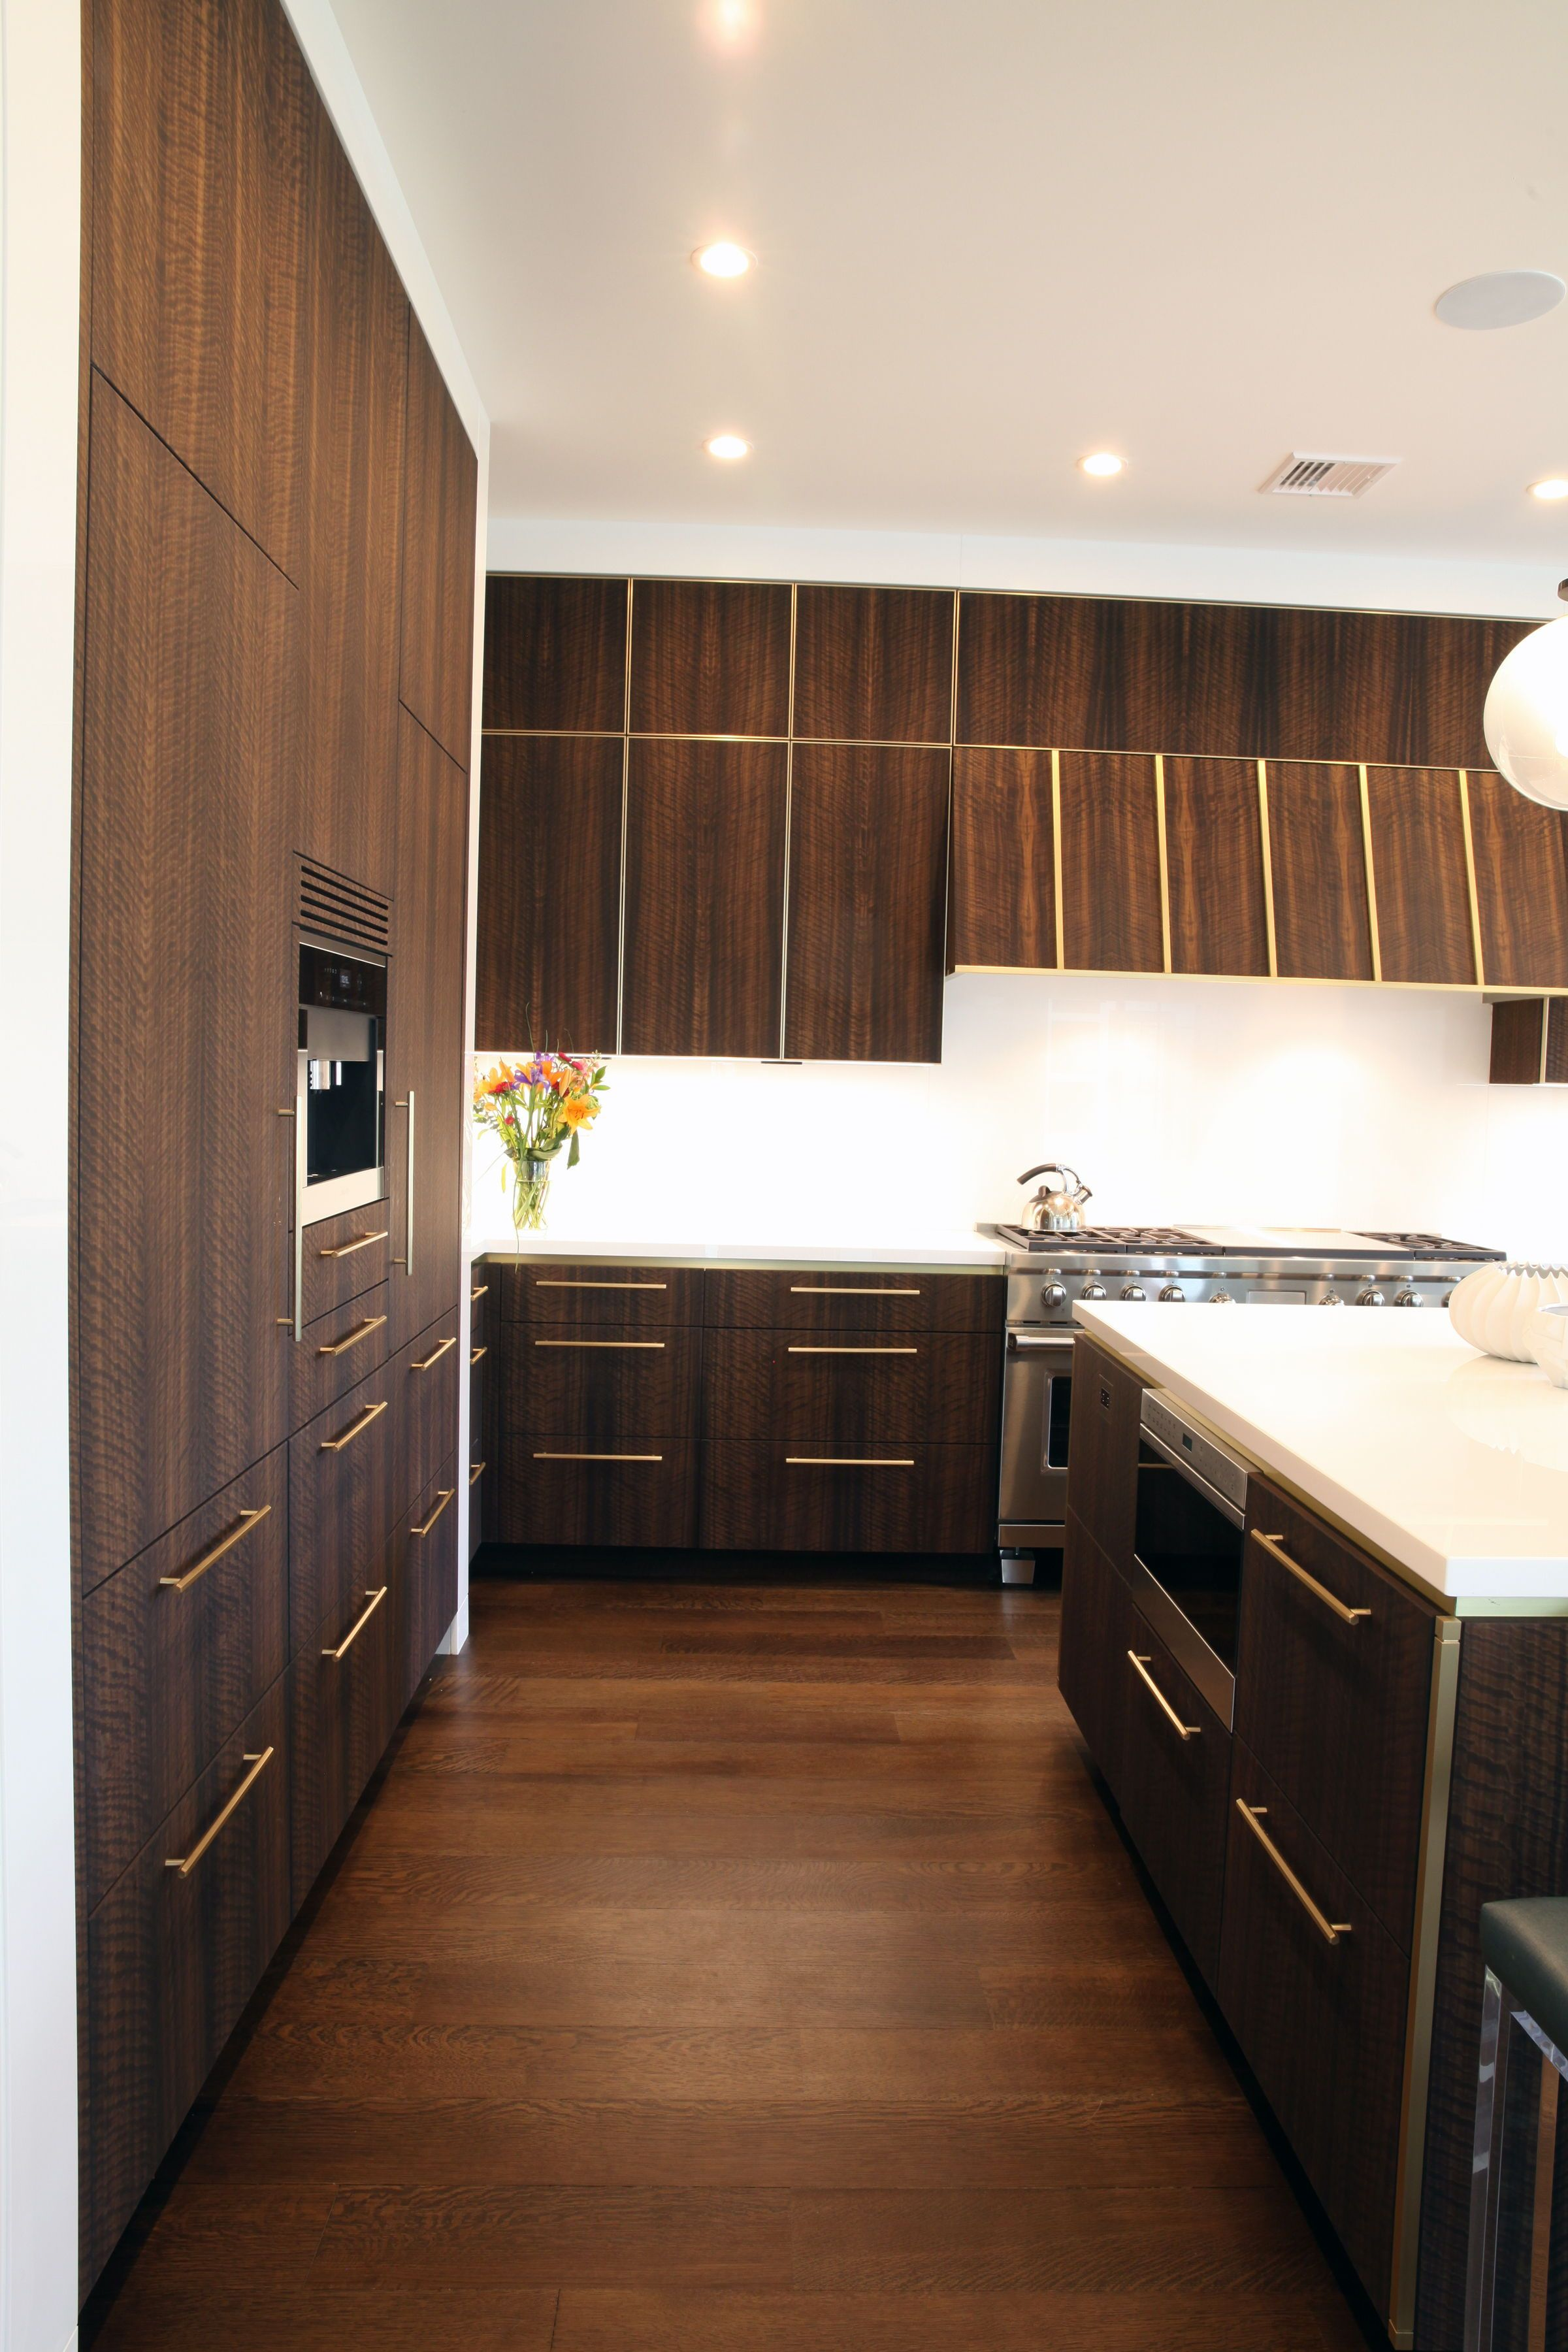 Modern Luxury Kitchen Soft Touch Eucalyptus Satin Brass Finish Westfield Nj Outdoor Kitchen Design Luxury Kitchens Kitchen Design